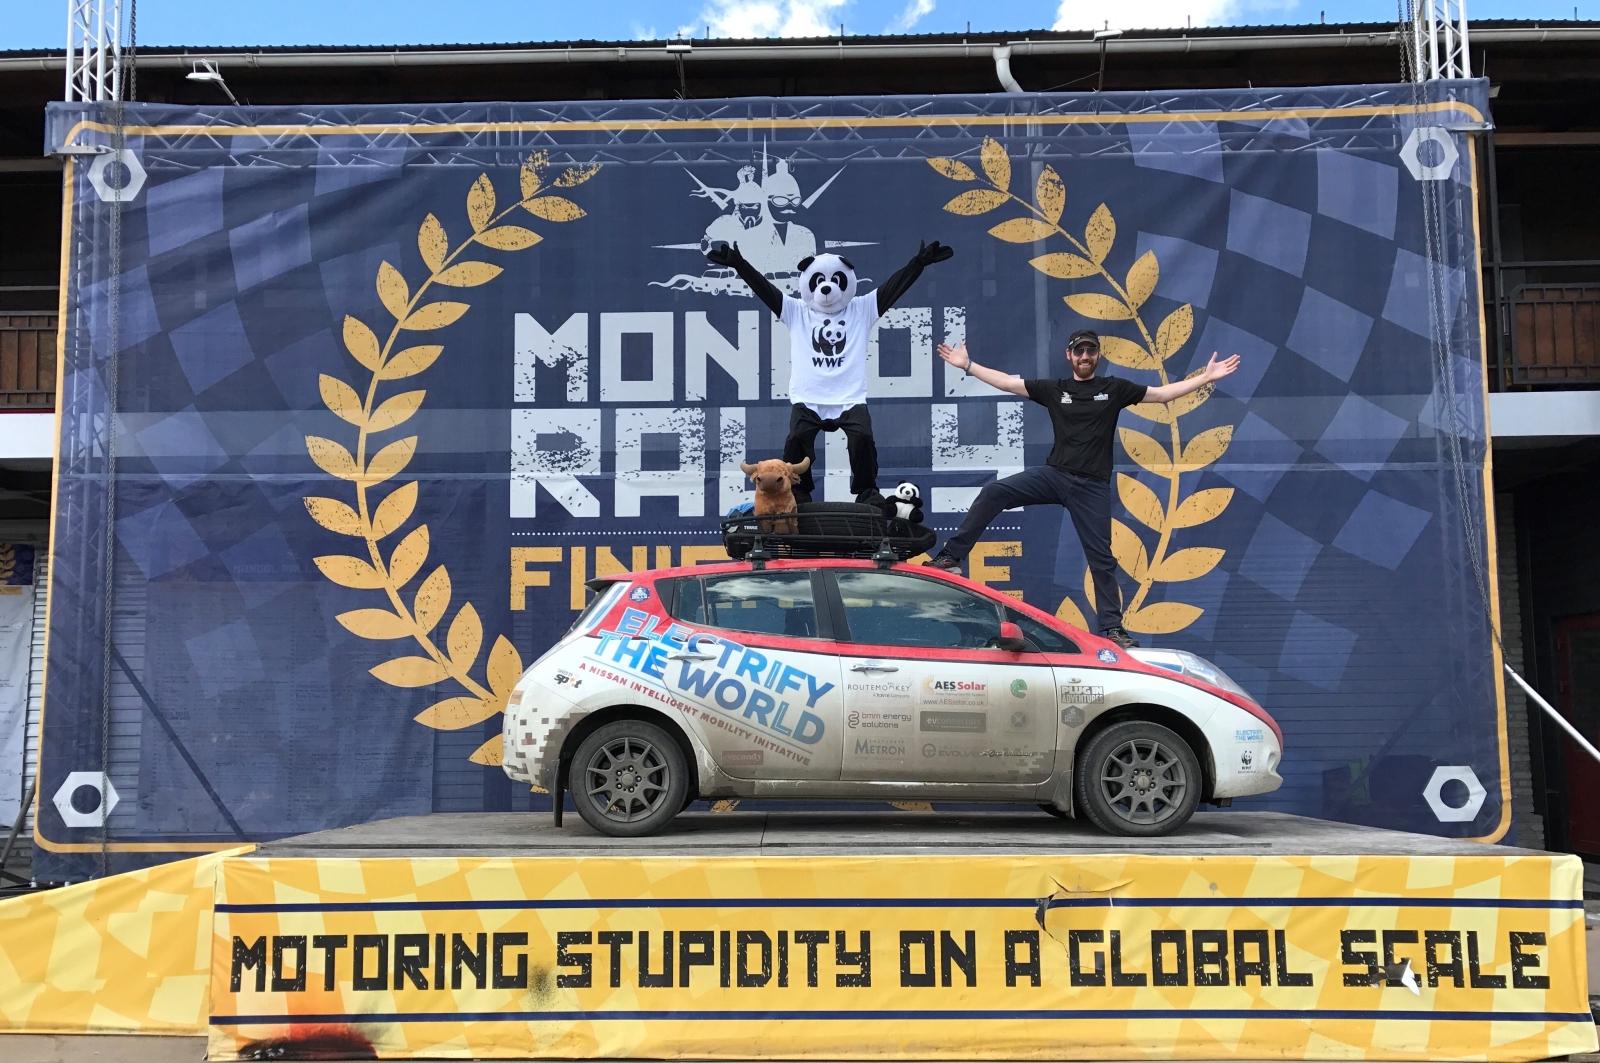 Nissan Leaf teljesítette a Mongol Rally-t